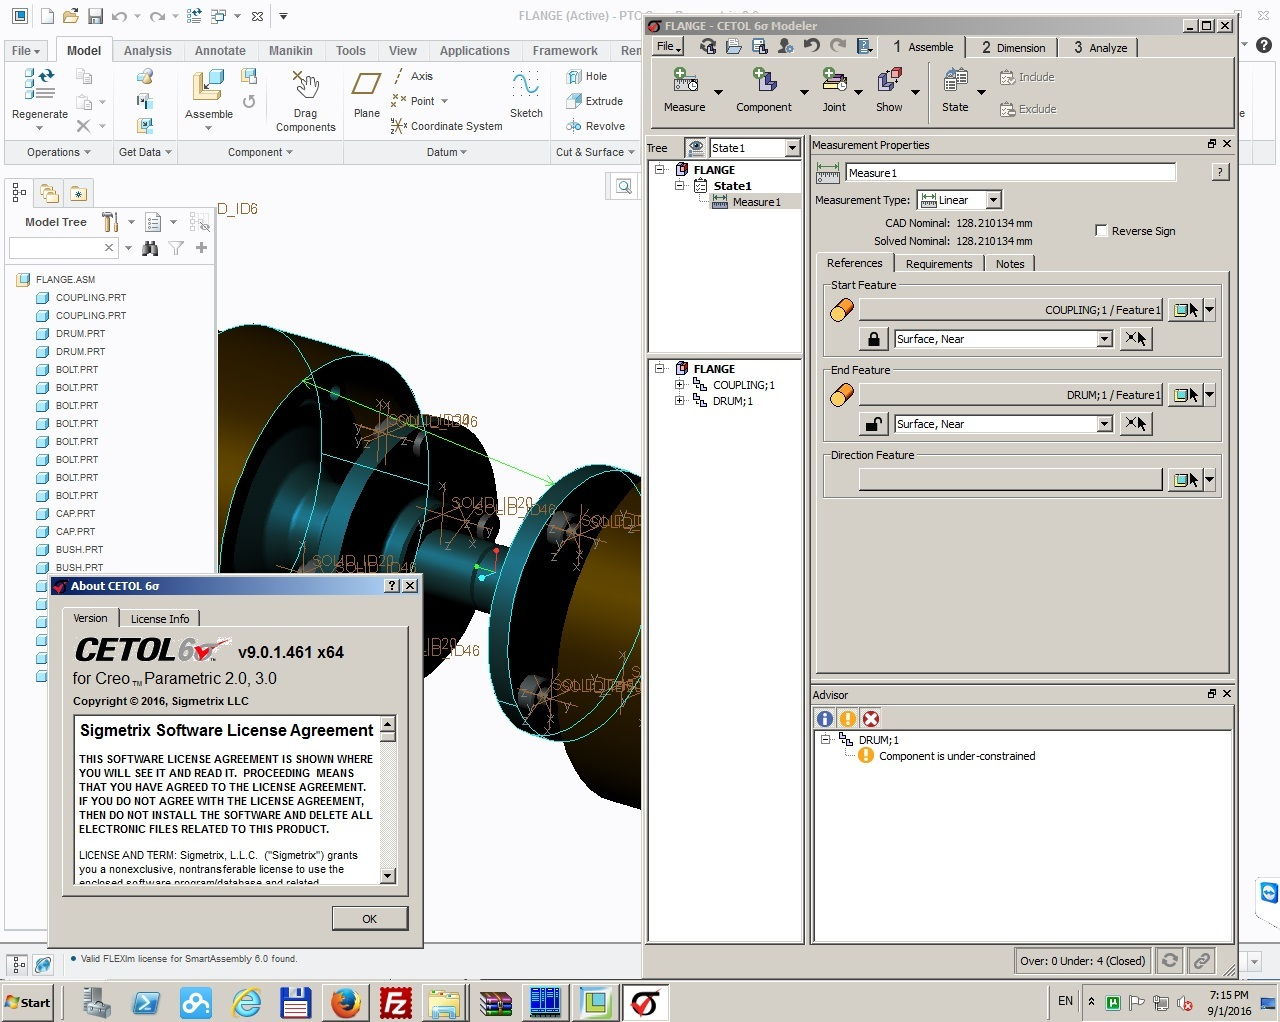 Working with Sigmetrix Cetol 6 v9.0.1 for PTC Creo 2.0-3.0 64bit full crack